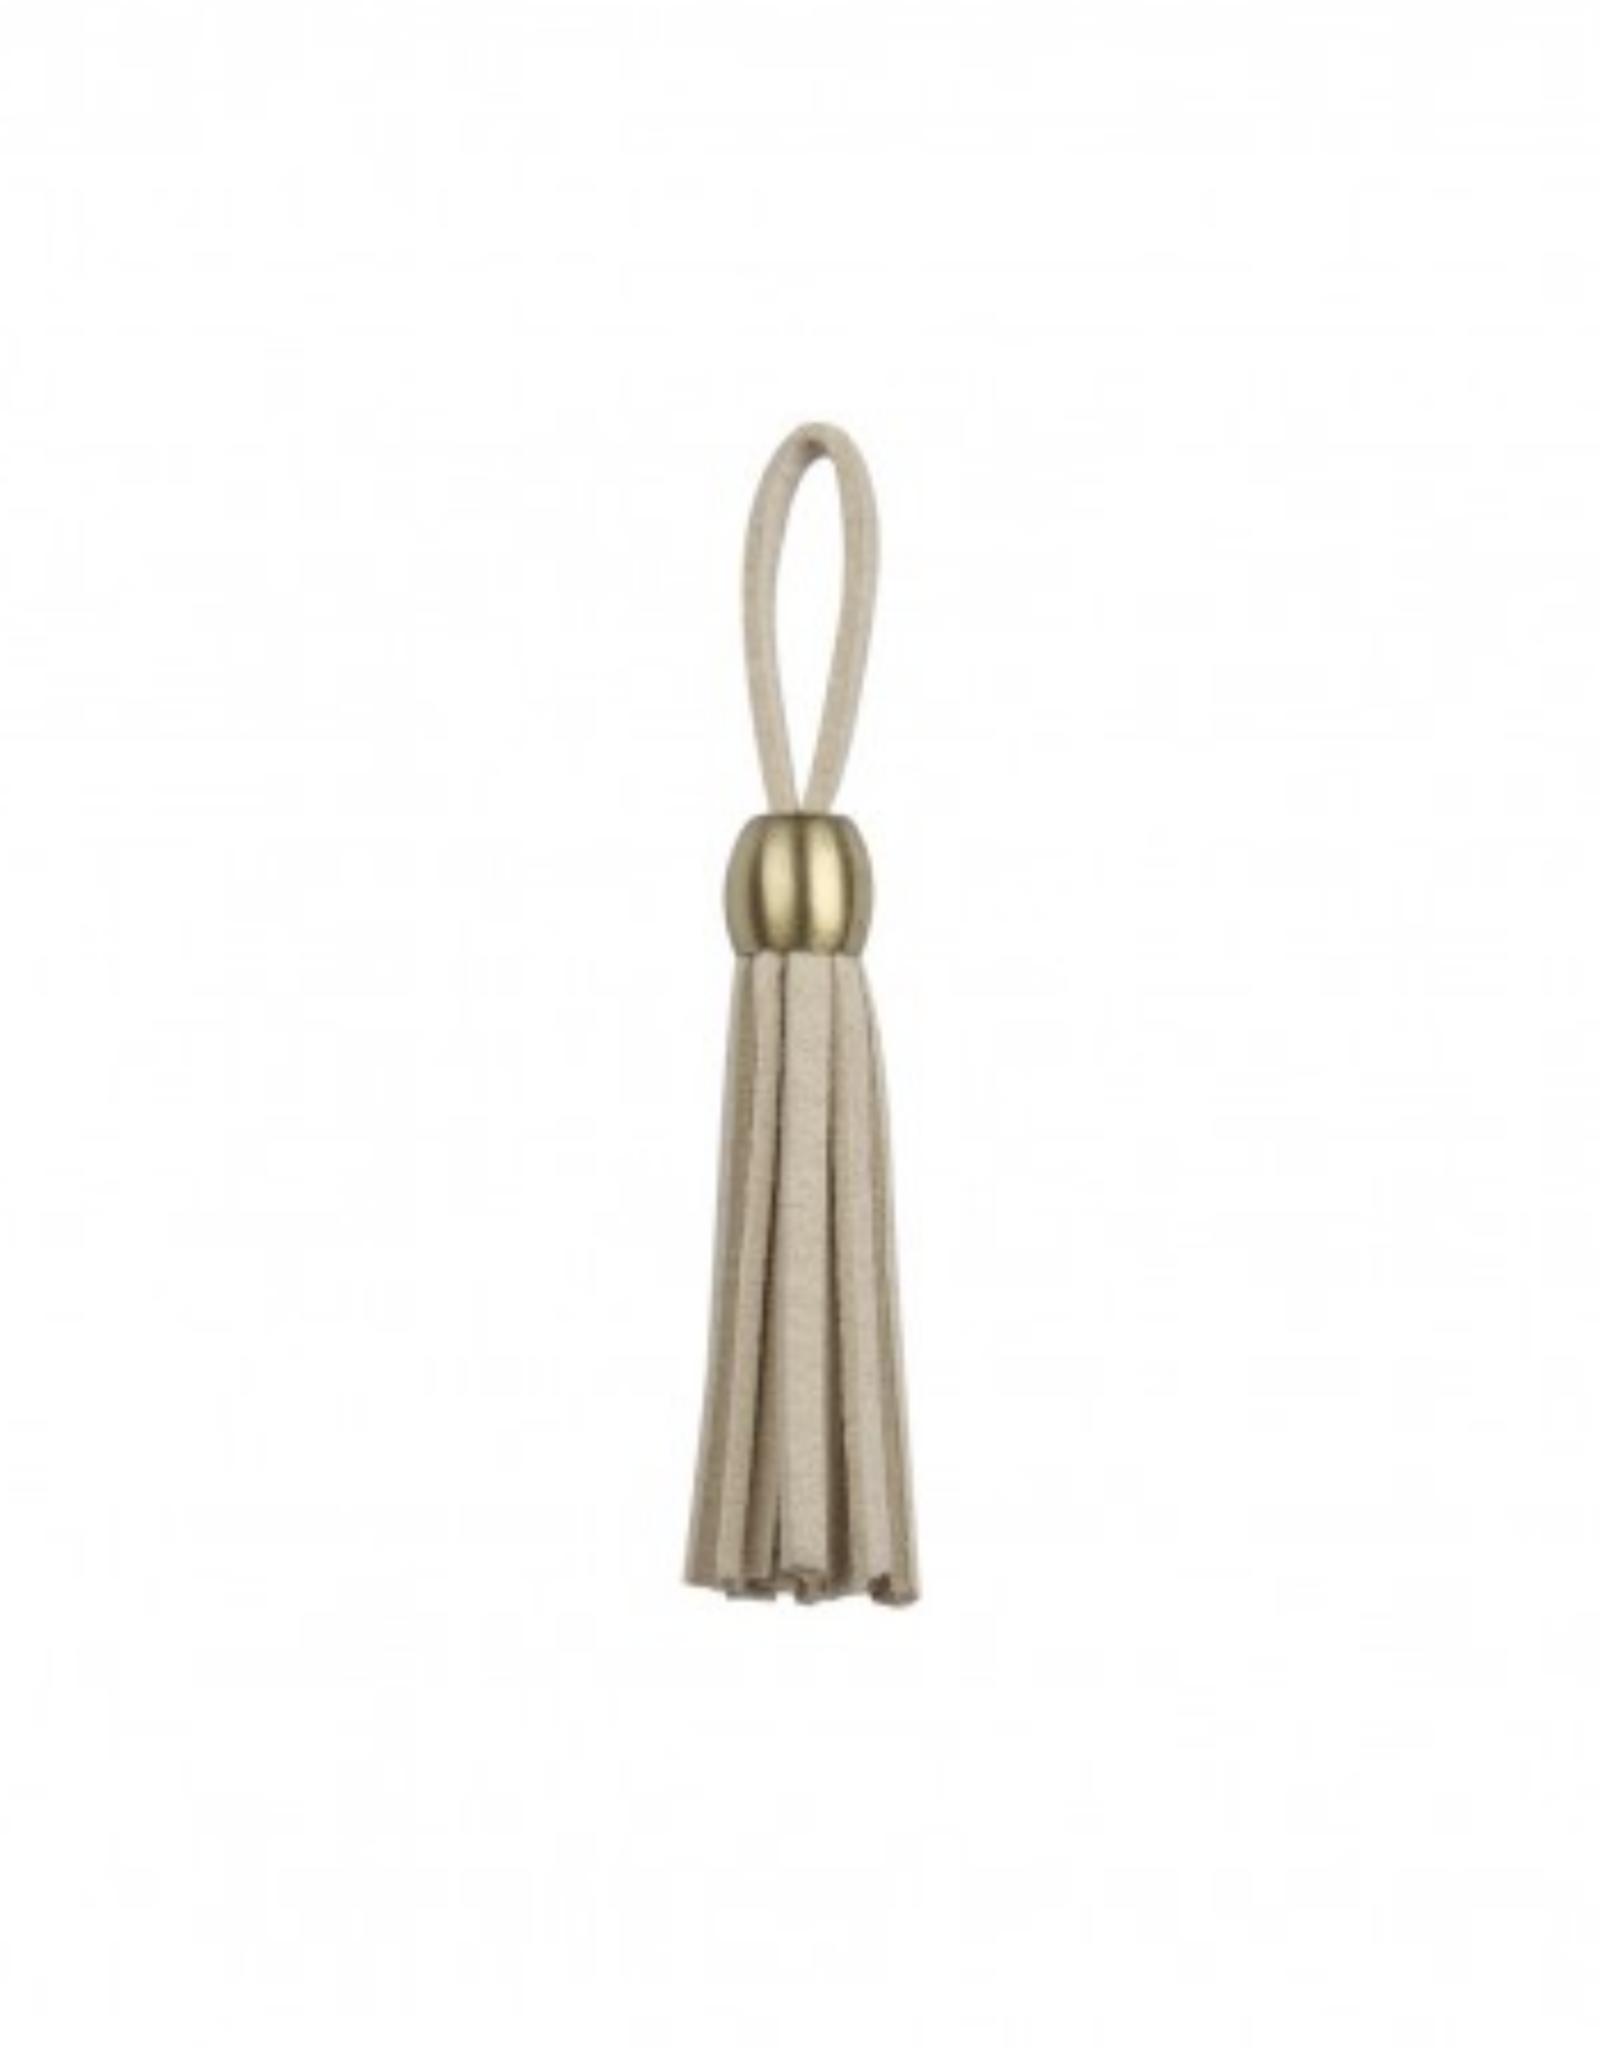 Clover Tassel - Brons 5mm - Ecru